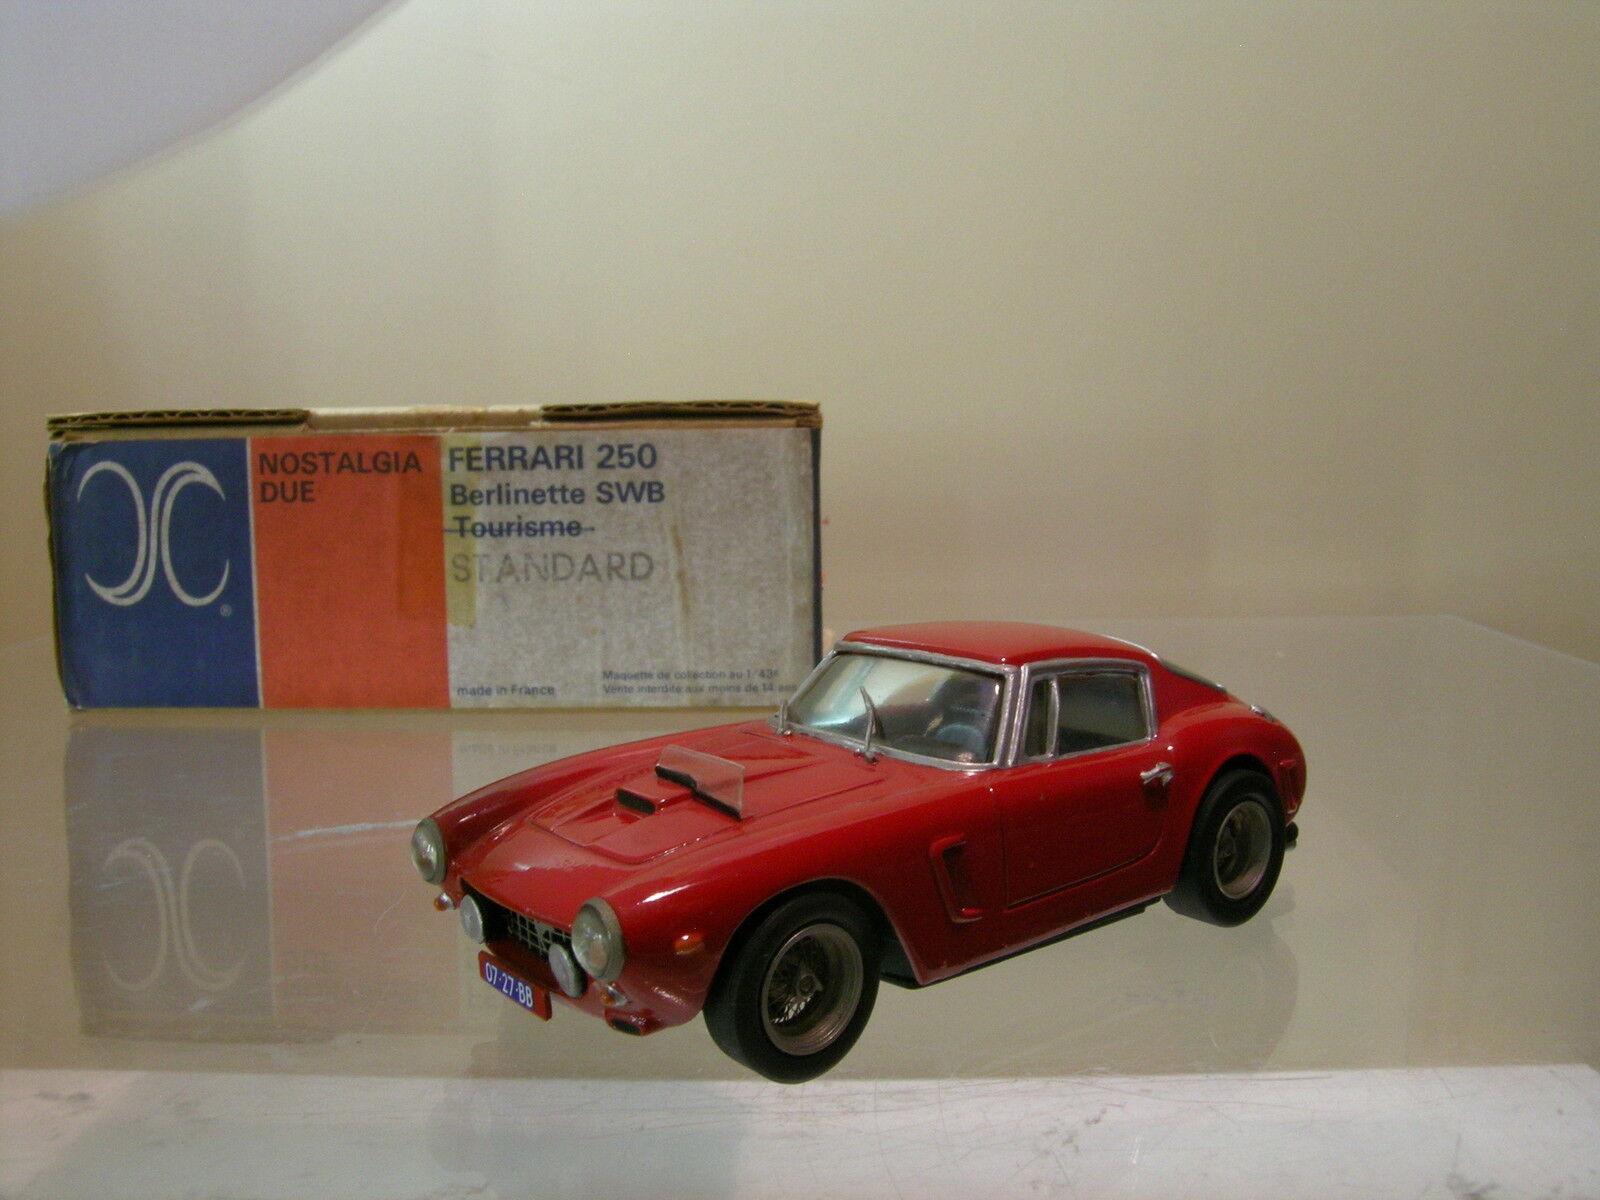 AMR FRANCE NOSTALGIIA DUE FERRARI 250 SWB BERL.1961 rouge HANDBUILT SCALE 1 43